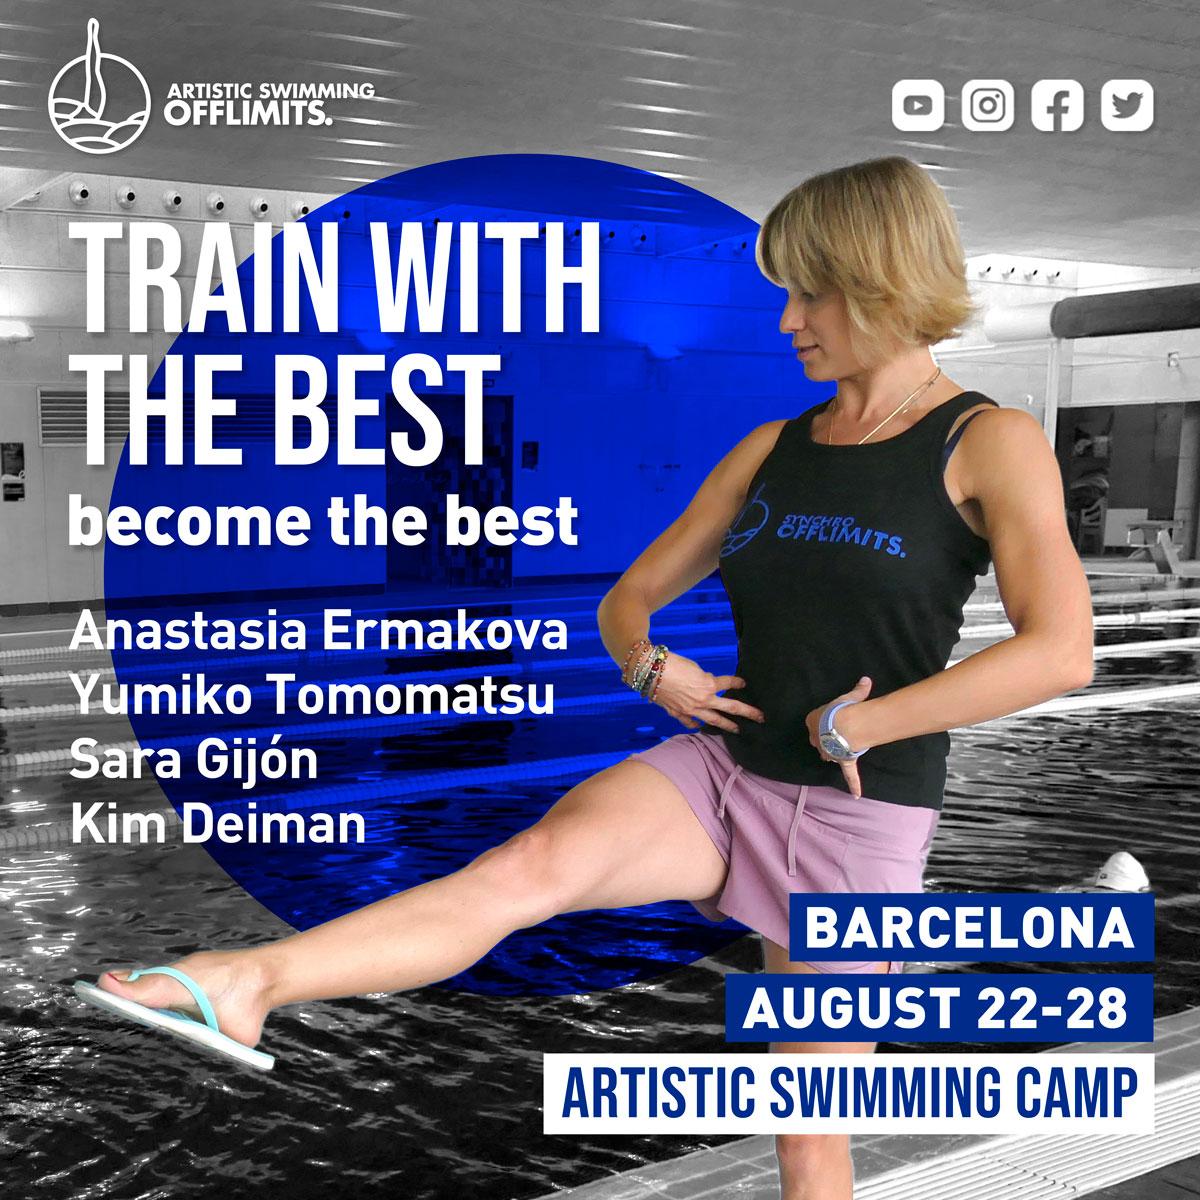 Artistic Swimming Summer Camp BCN 2021 – Fullboard